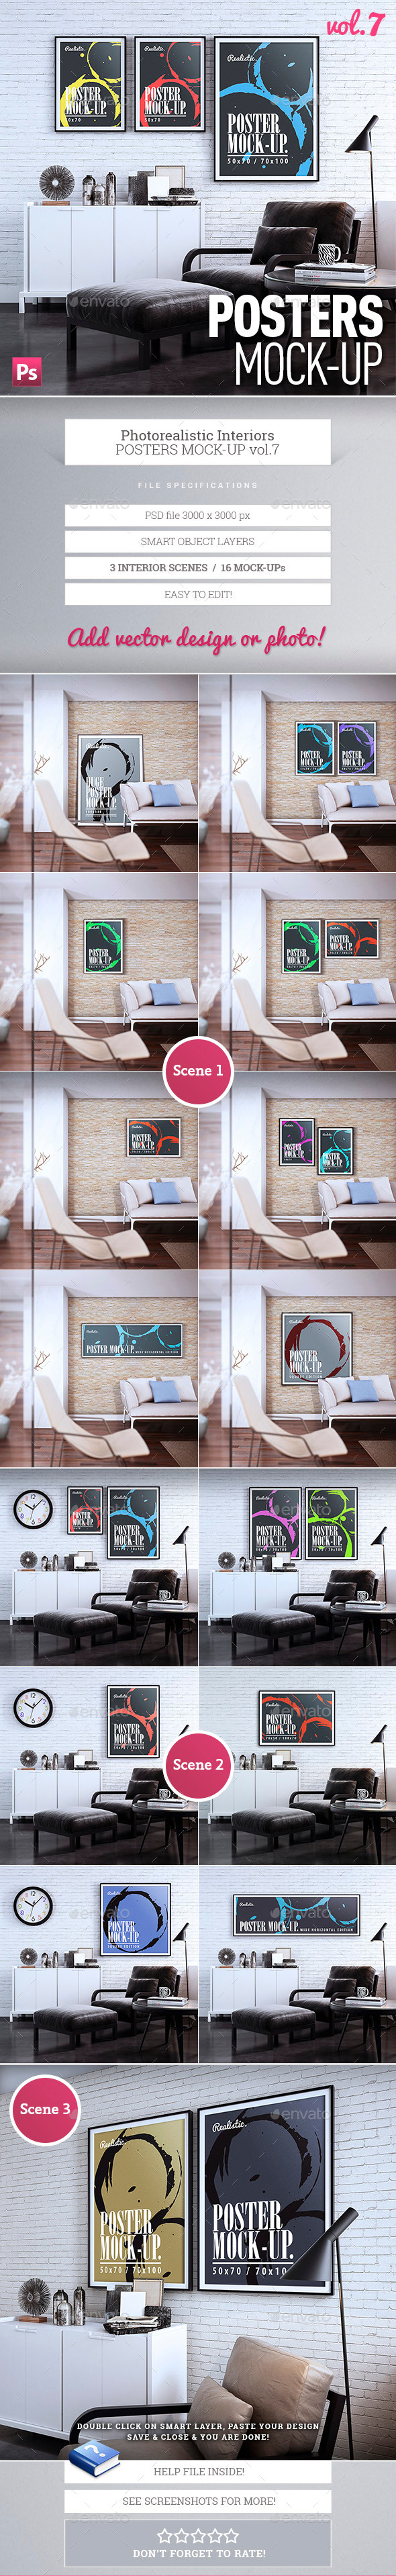 Posters Mock-Up vol.7 - Product Mock-Ups Graphics